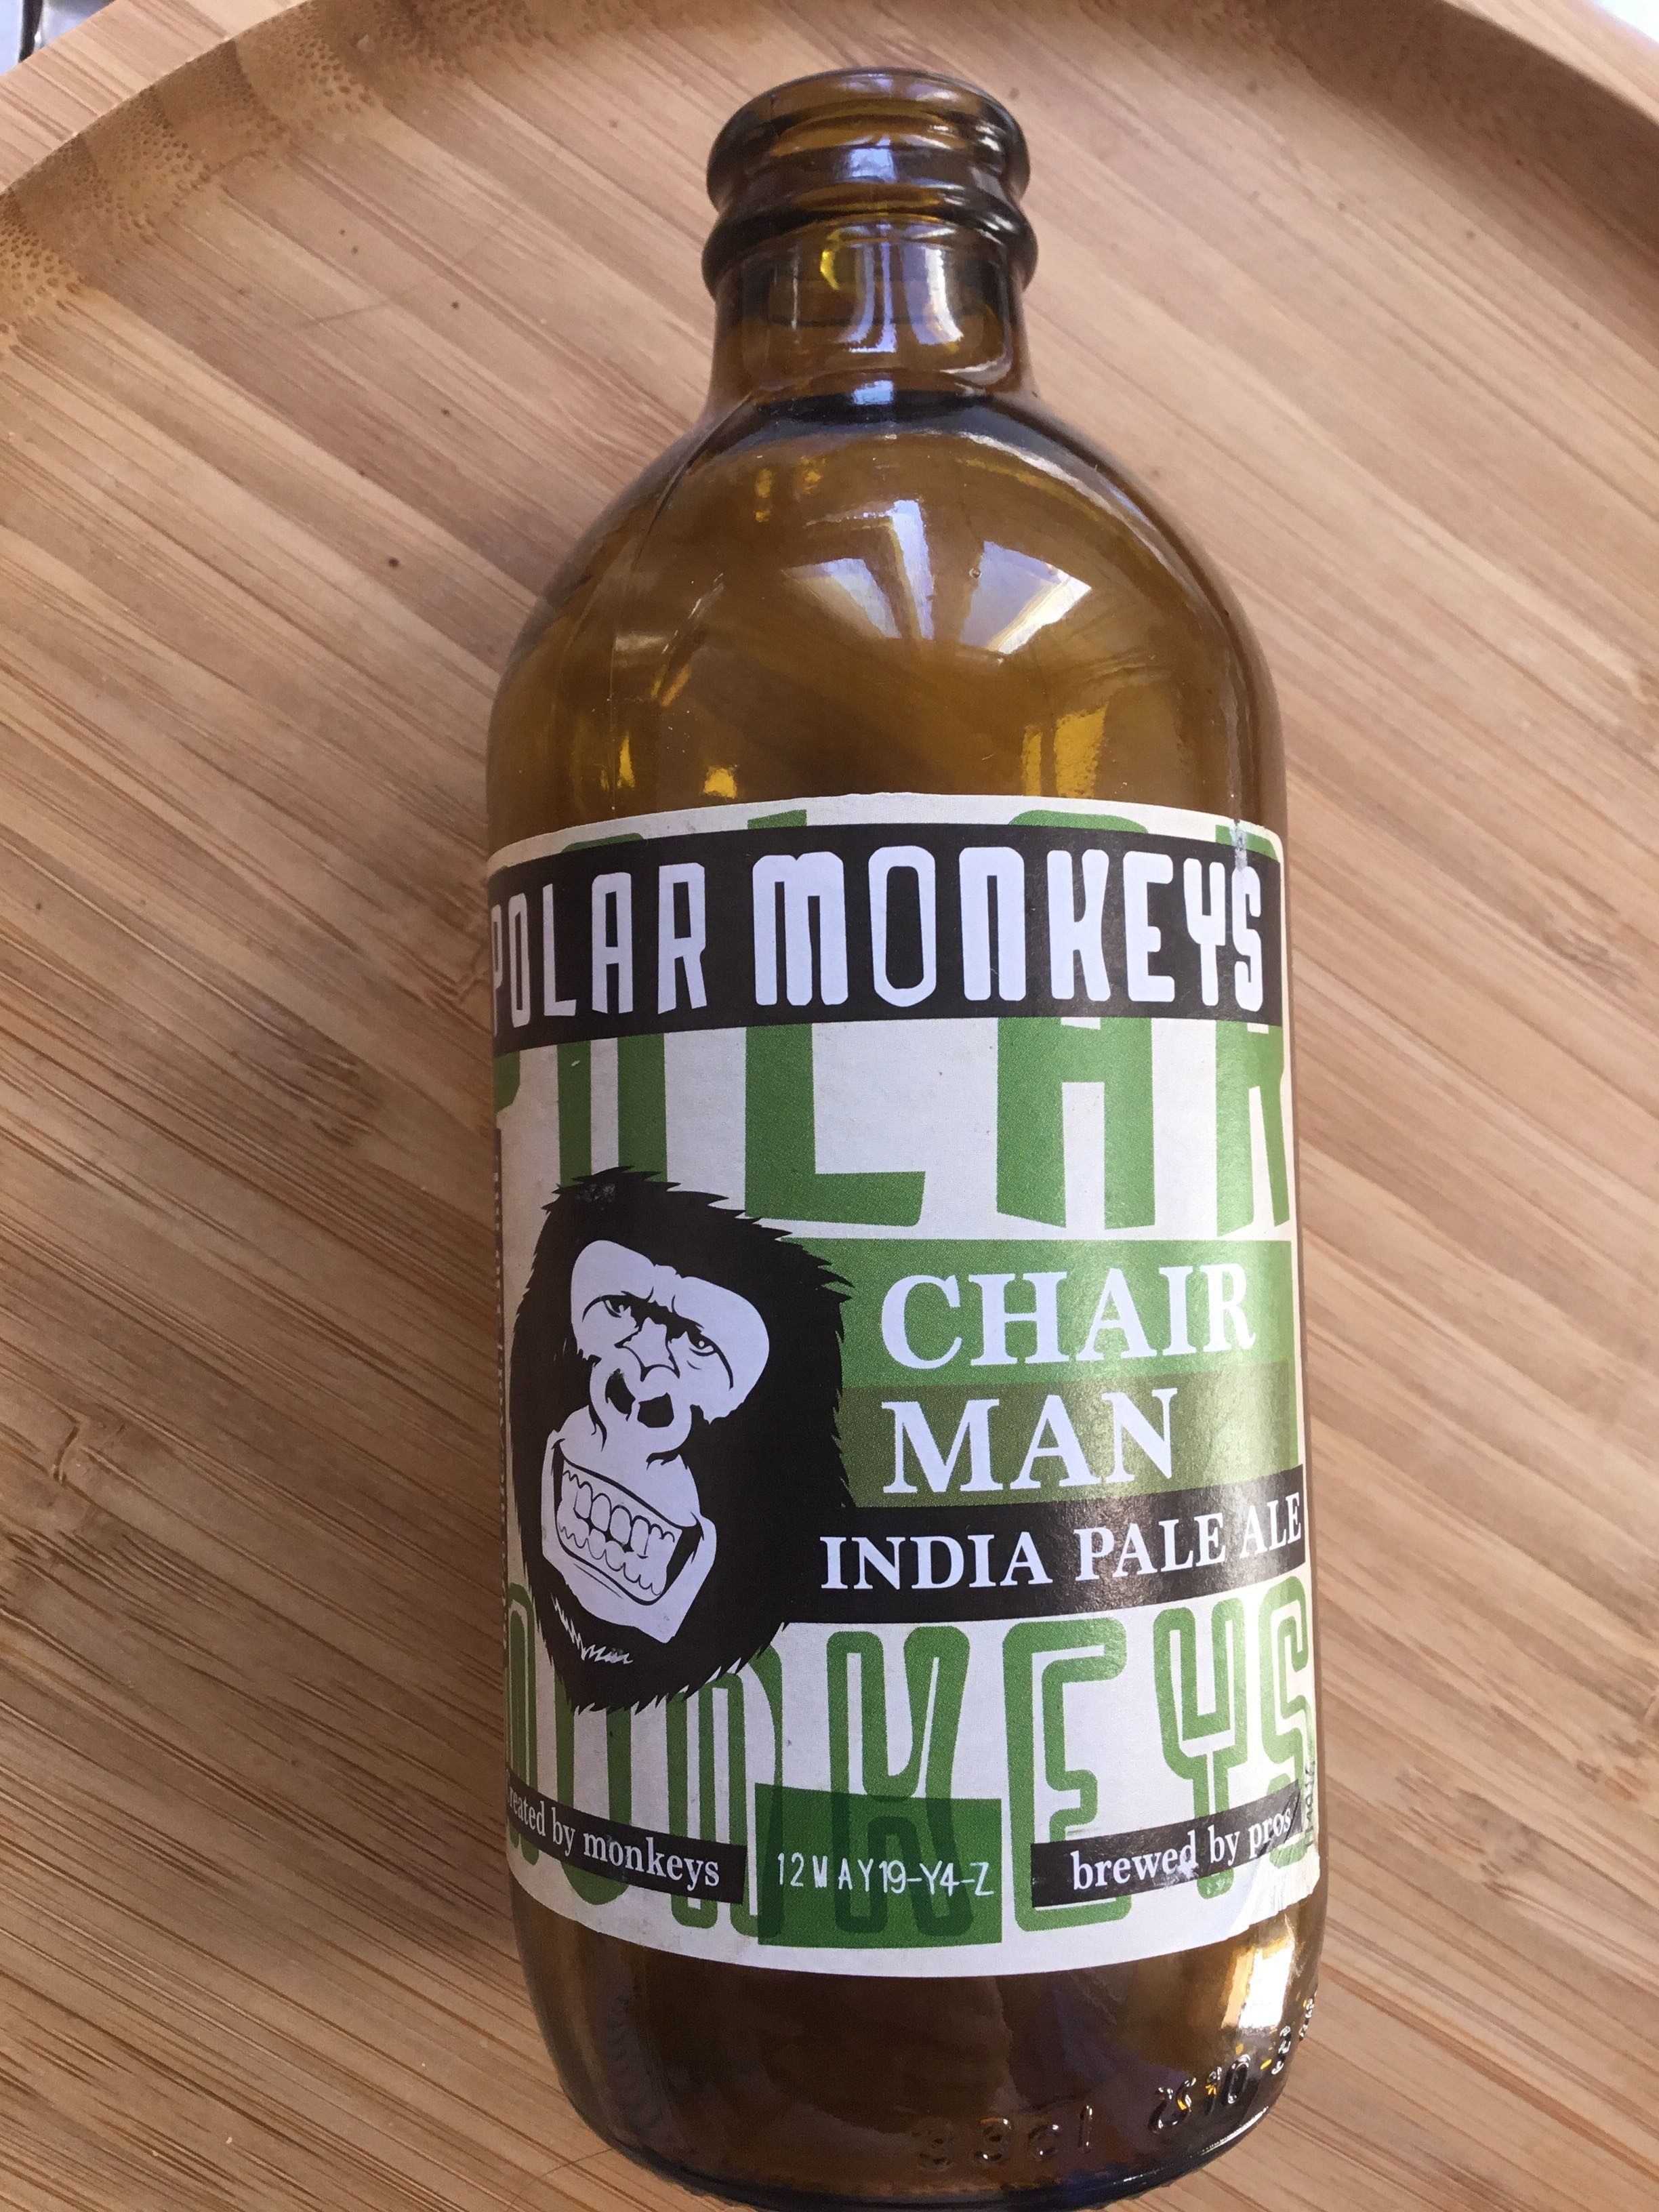 Polar monkeys chairman ipa - Product - en